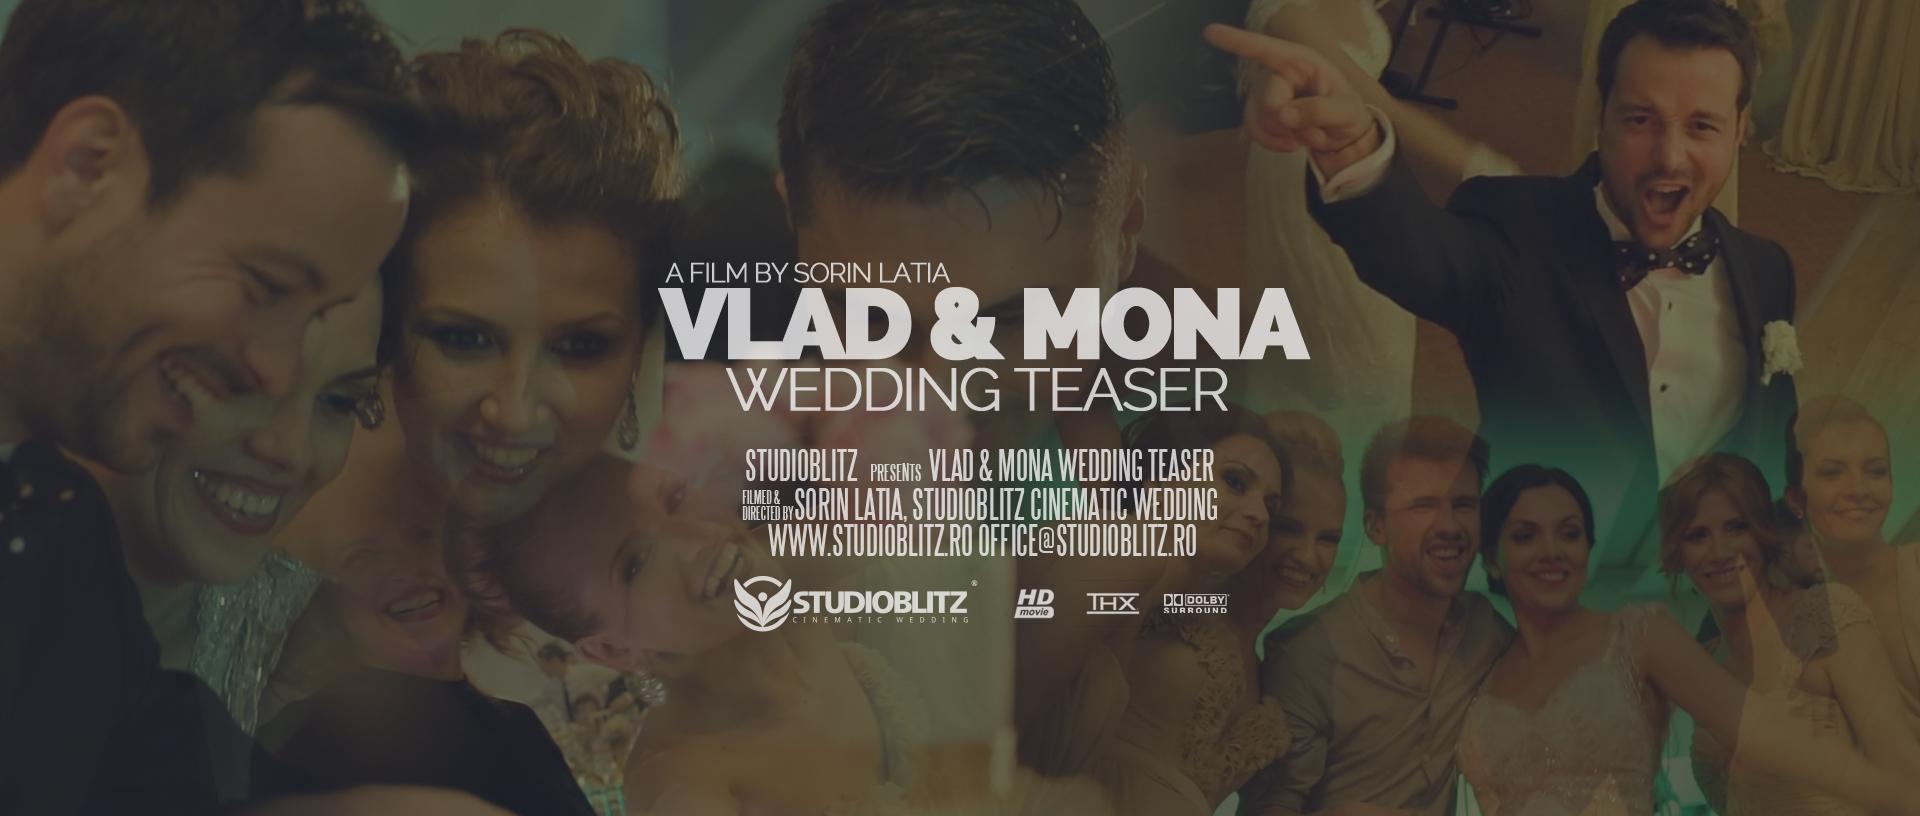 coperta-filmare-nunta-craiova-mona-si-vlad-teaser